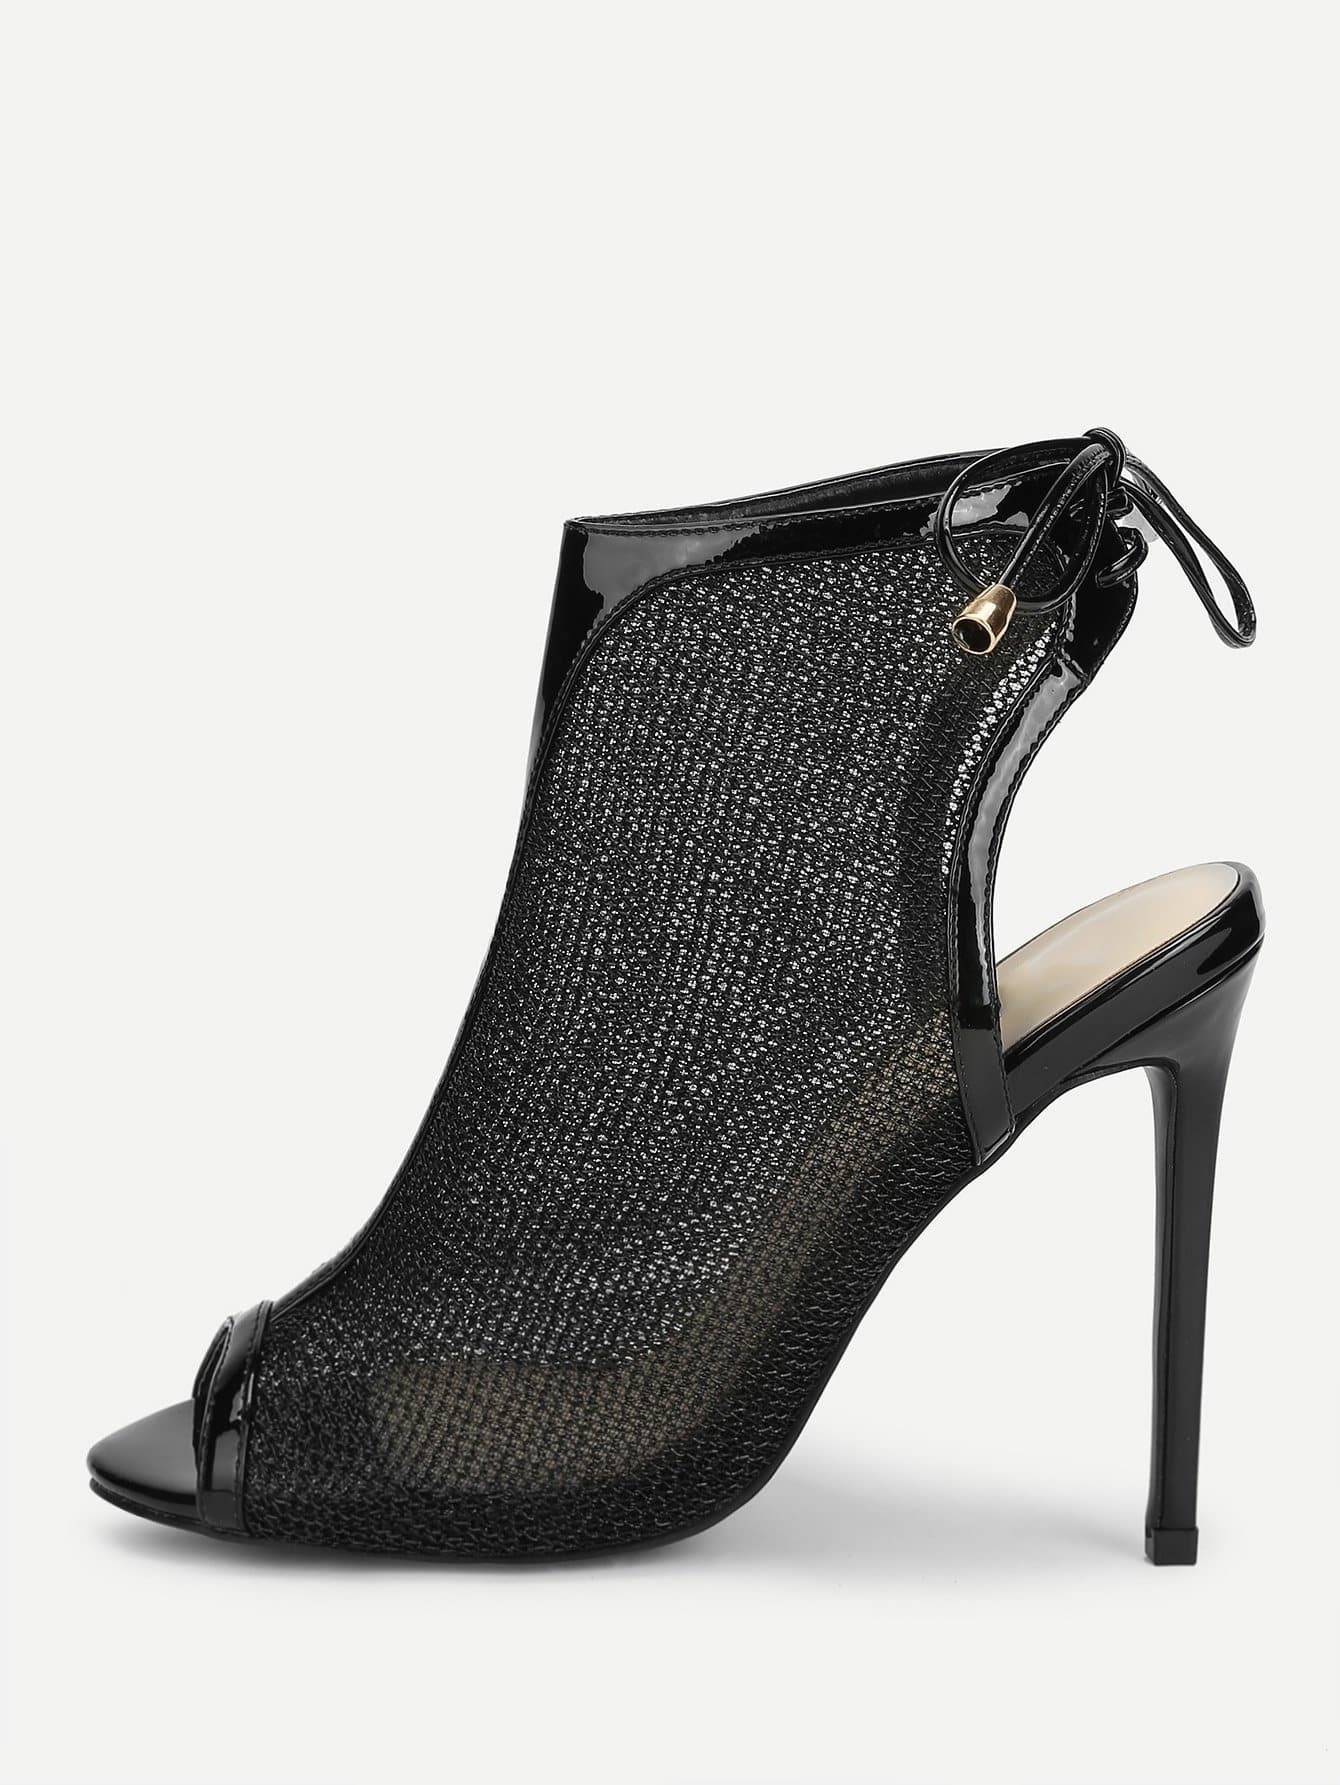 Купить Peep Toe Mesh на высоких каблуках сандалии, null, SheIn